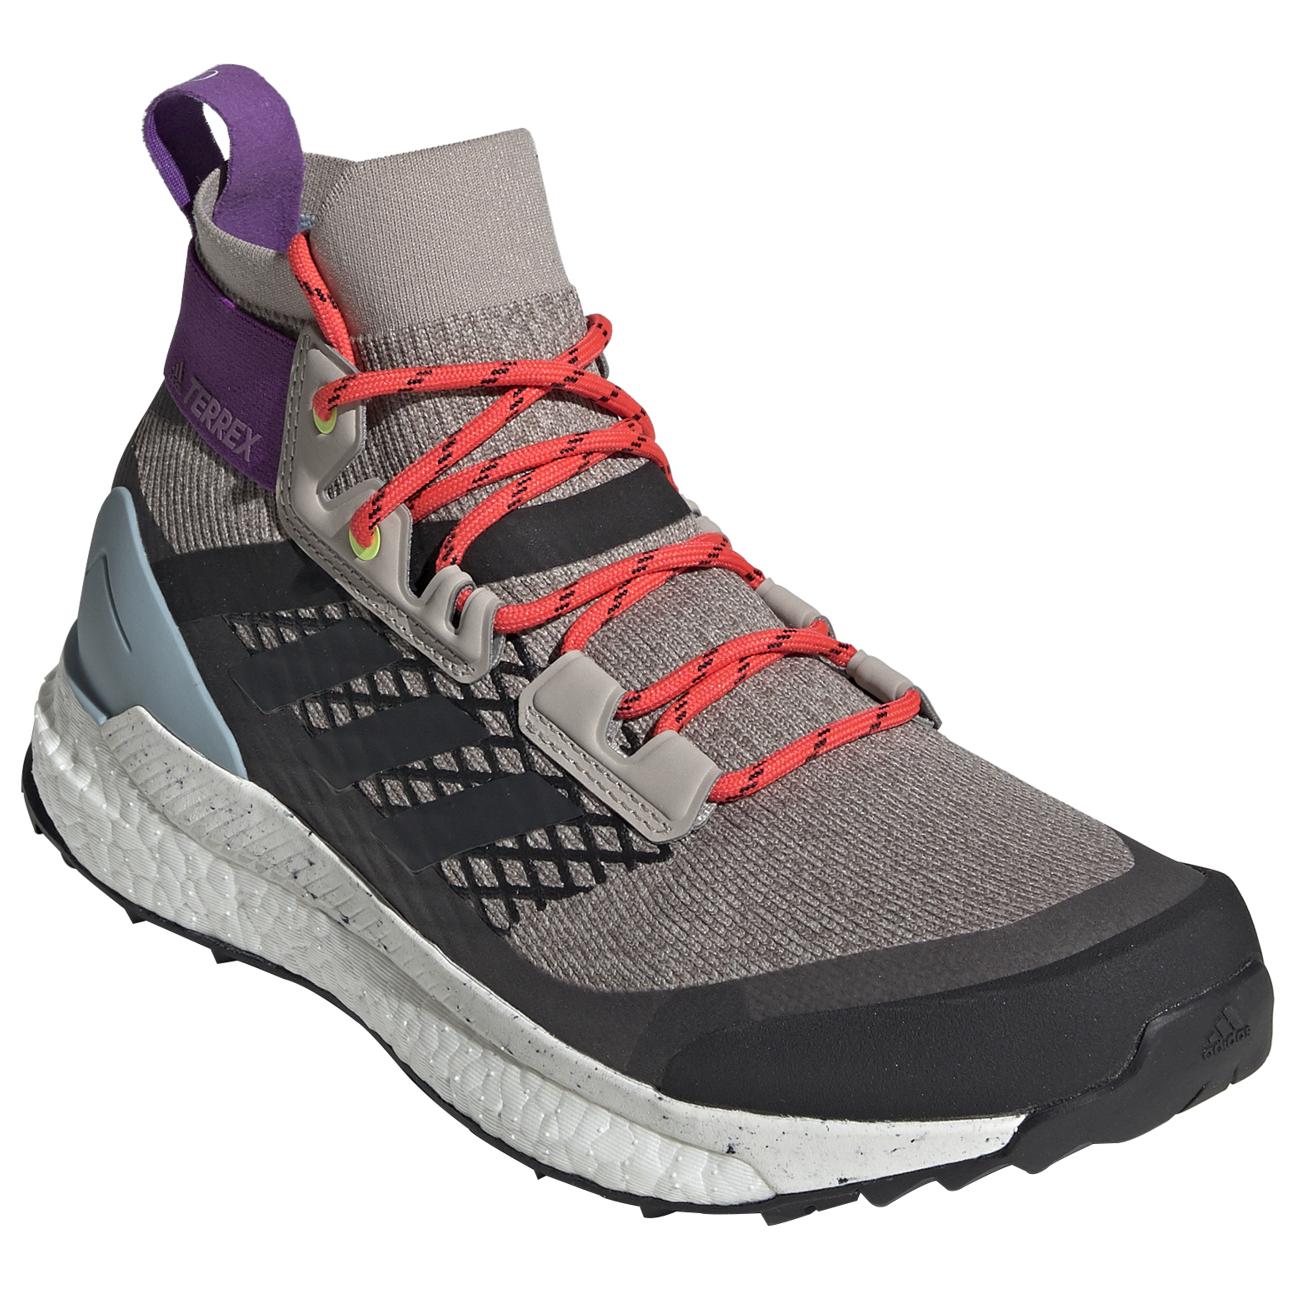 adidas Women's Terrex Free Hiker Botas de trekking Carbon Blutin Ash Grey | 4 (UK)